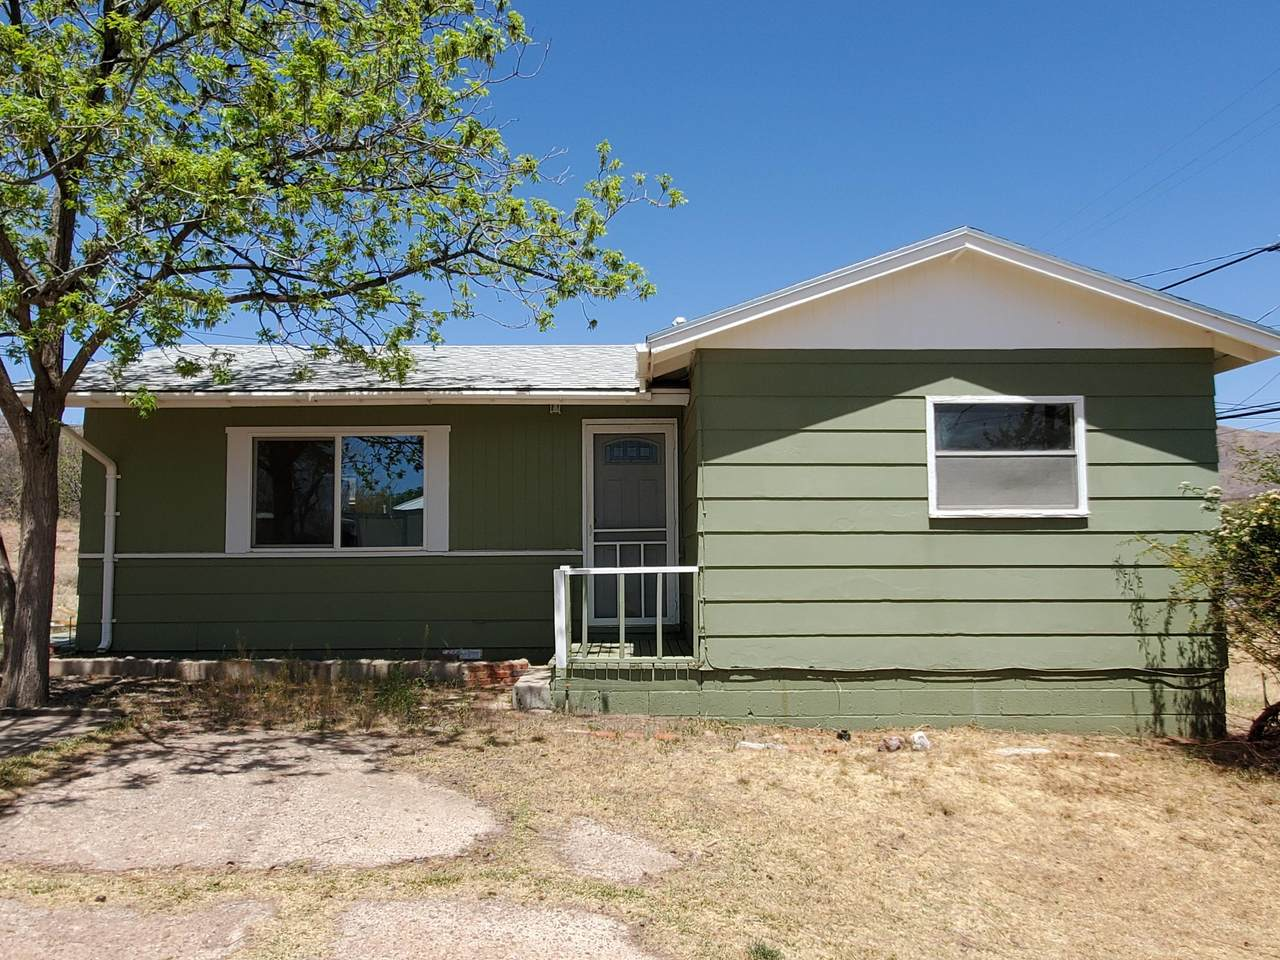 5, 5A Cochise Row - Photo 1